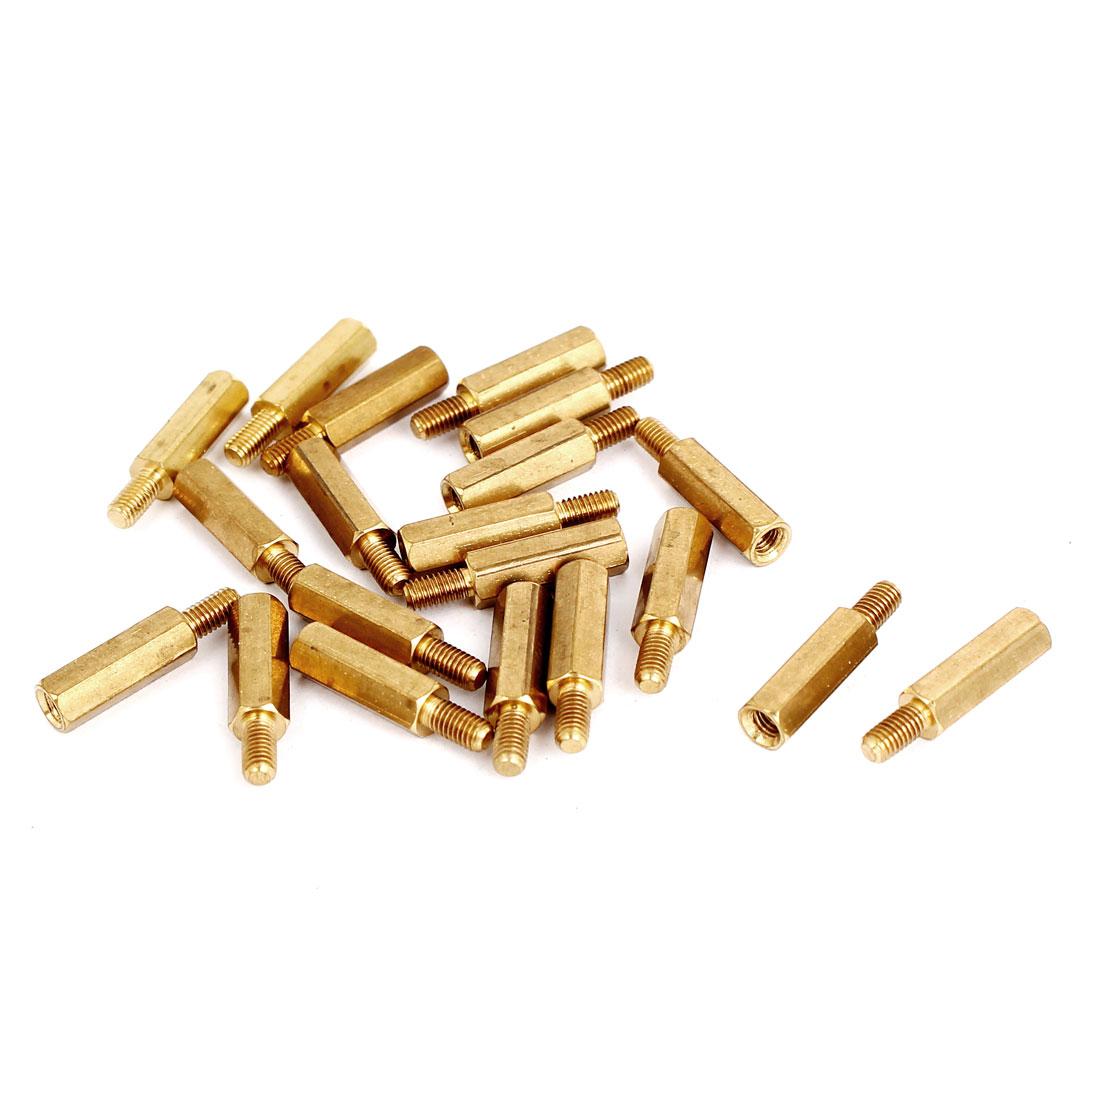 Unique Bargains M3 Male/Female Thread Brass Hexagonal PCB Spacer Standoff Support 14mm+6mm 20pcs